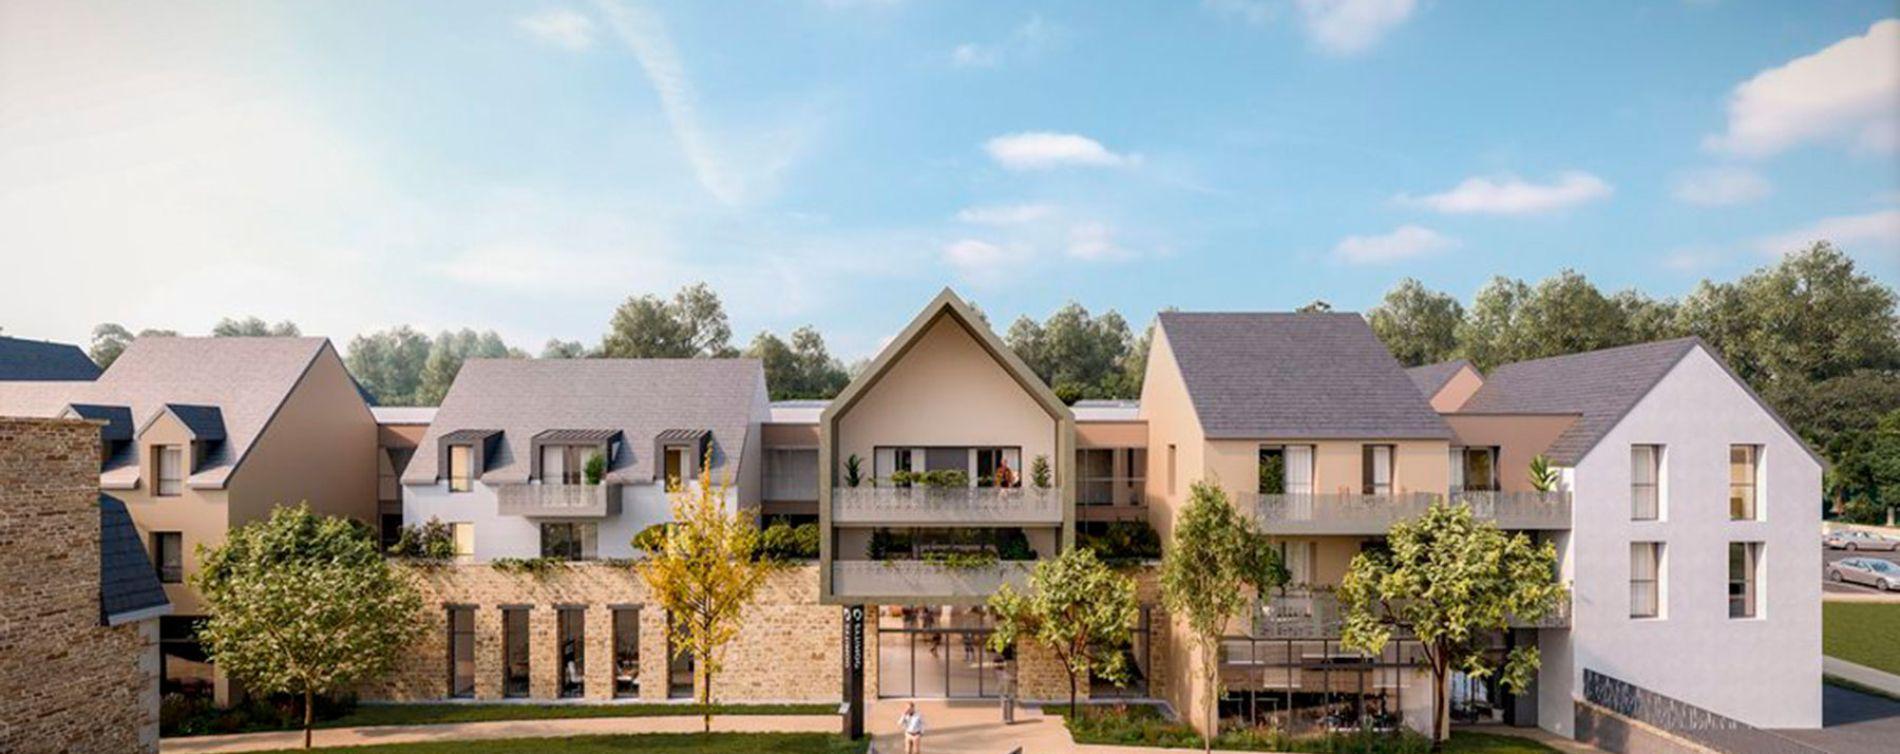 Dinan : programme immobilier neuve « Les Jardins d'Ahna »